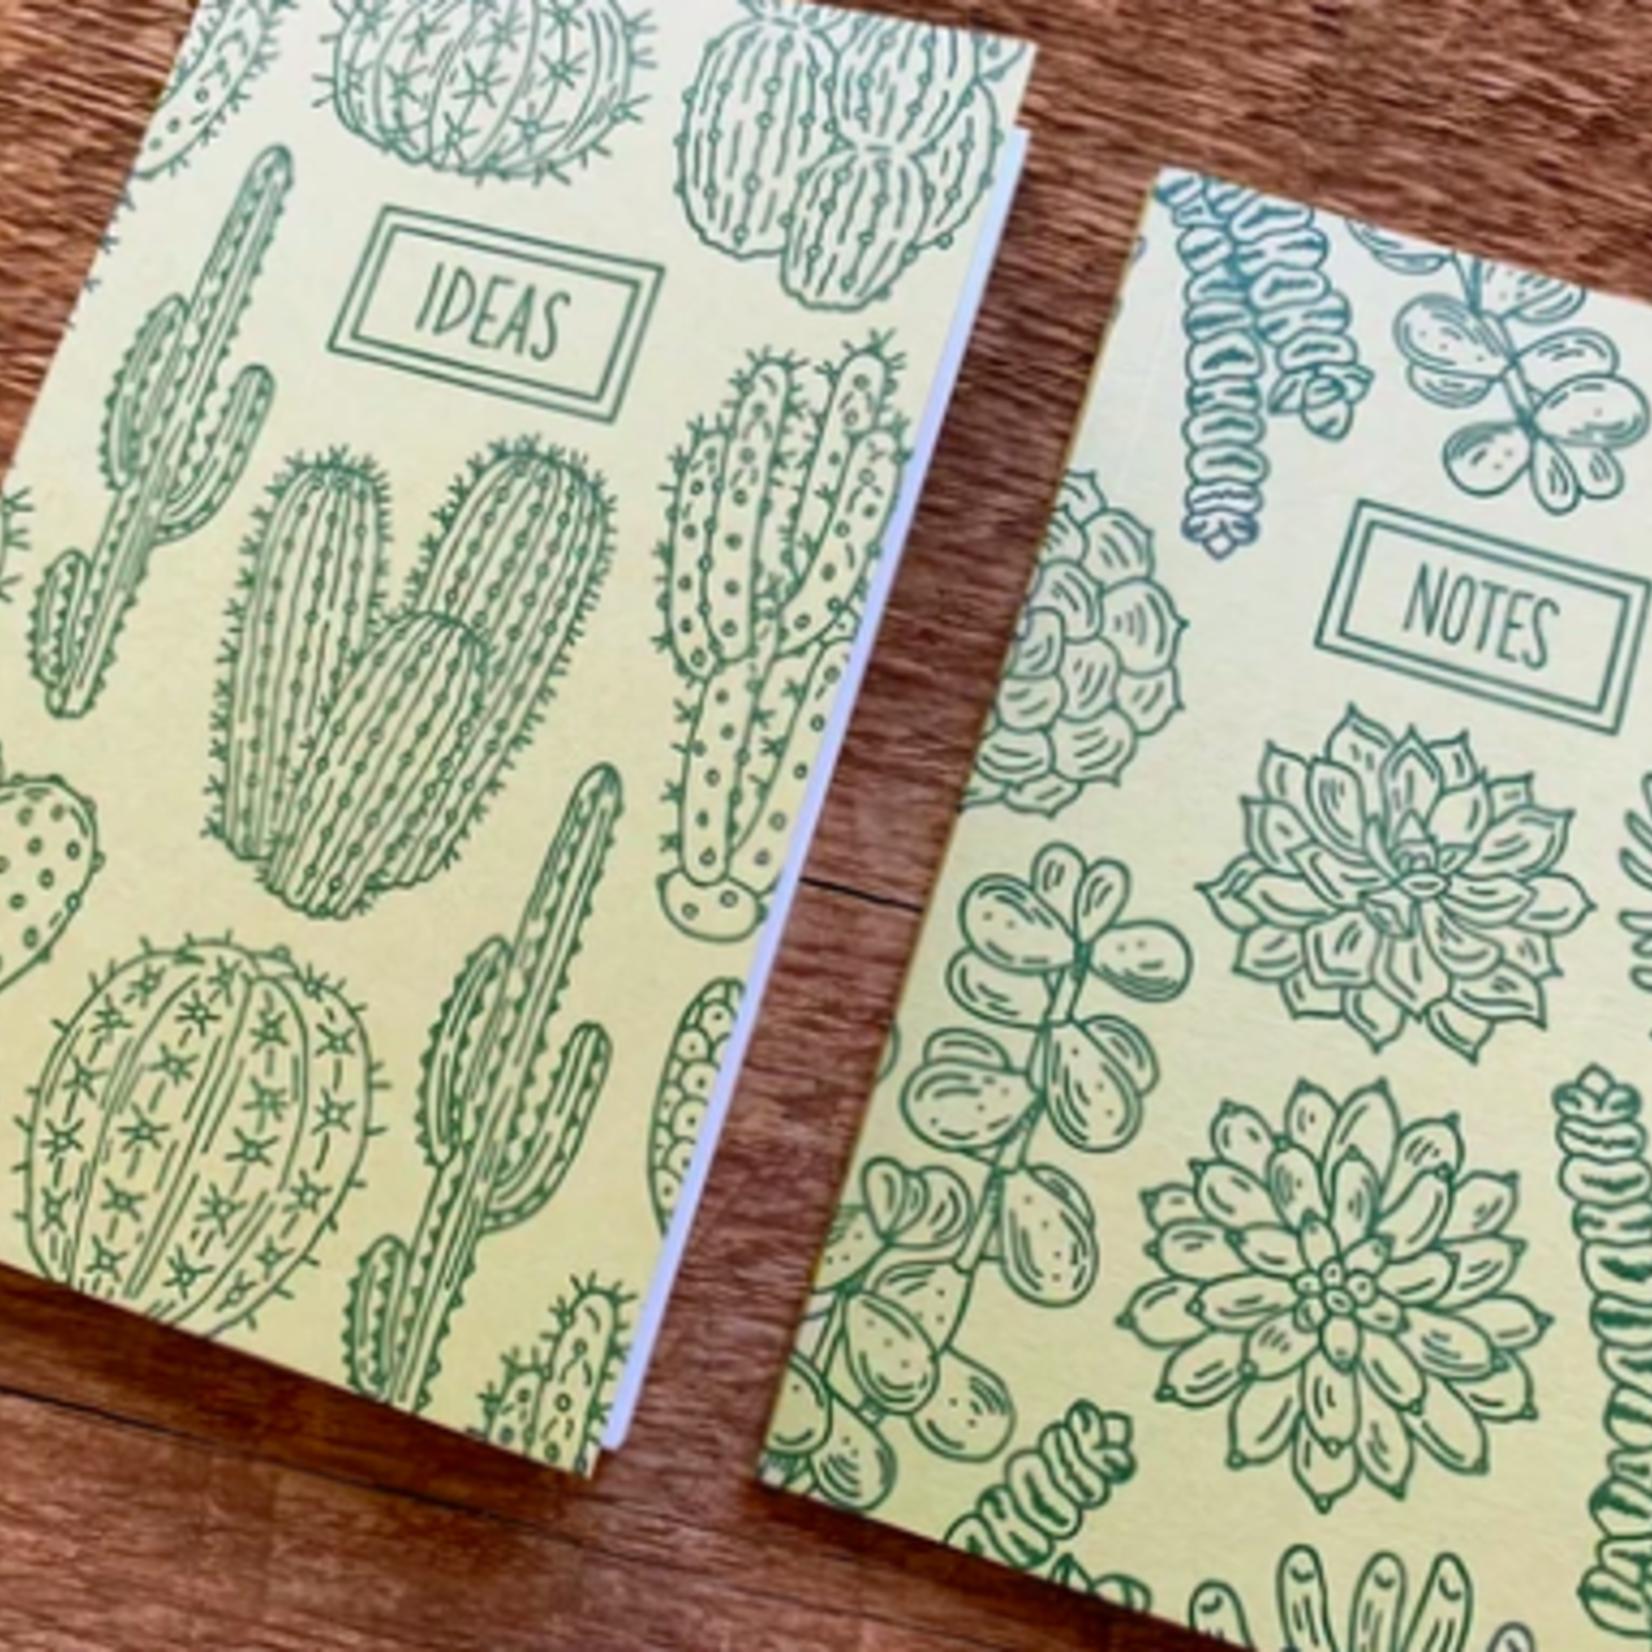 Noteworthy Cacti & Succulents Notebook Set